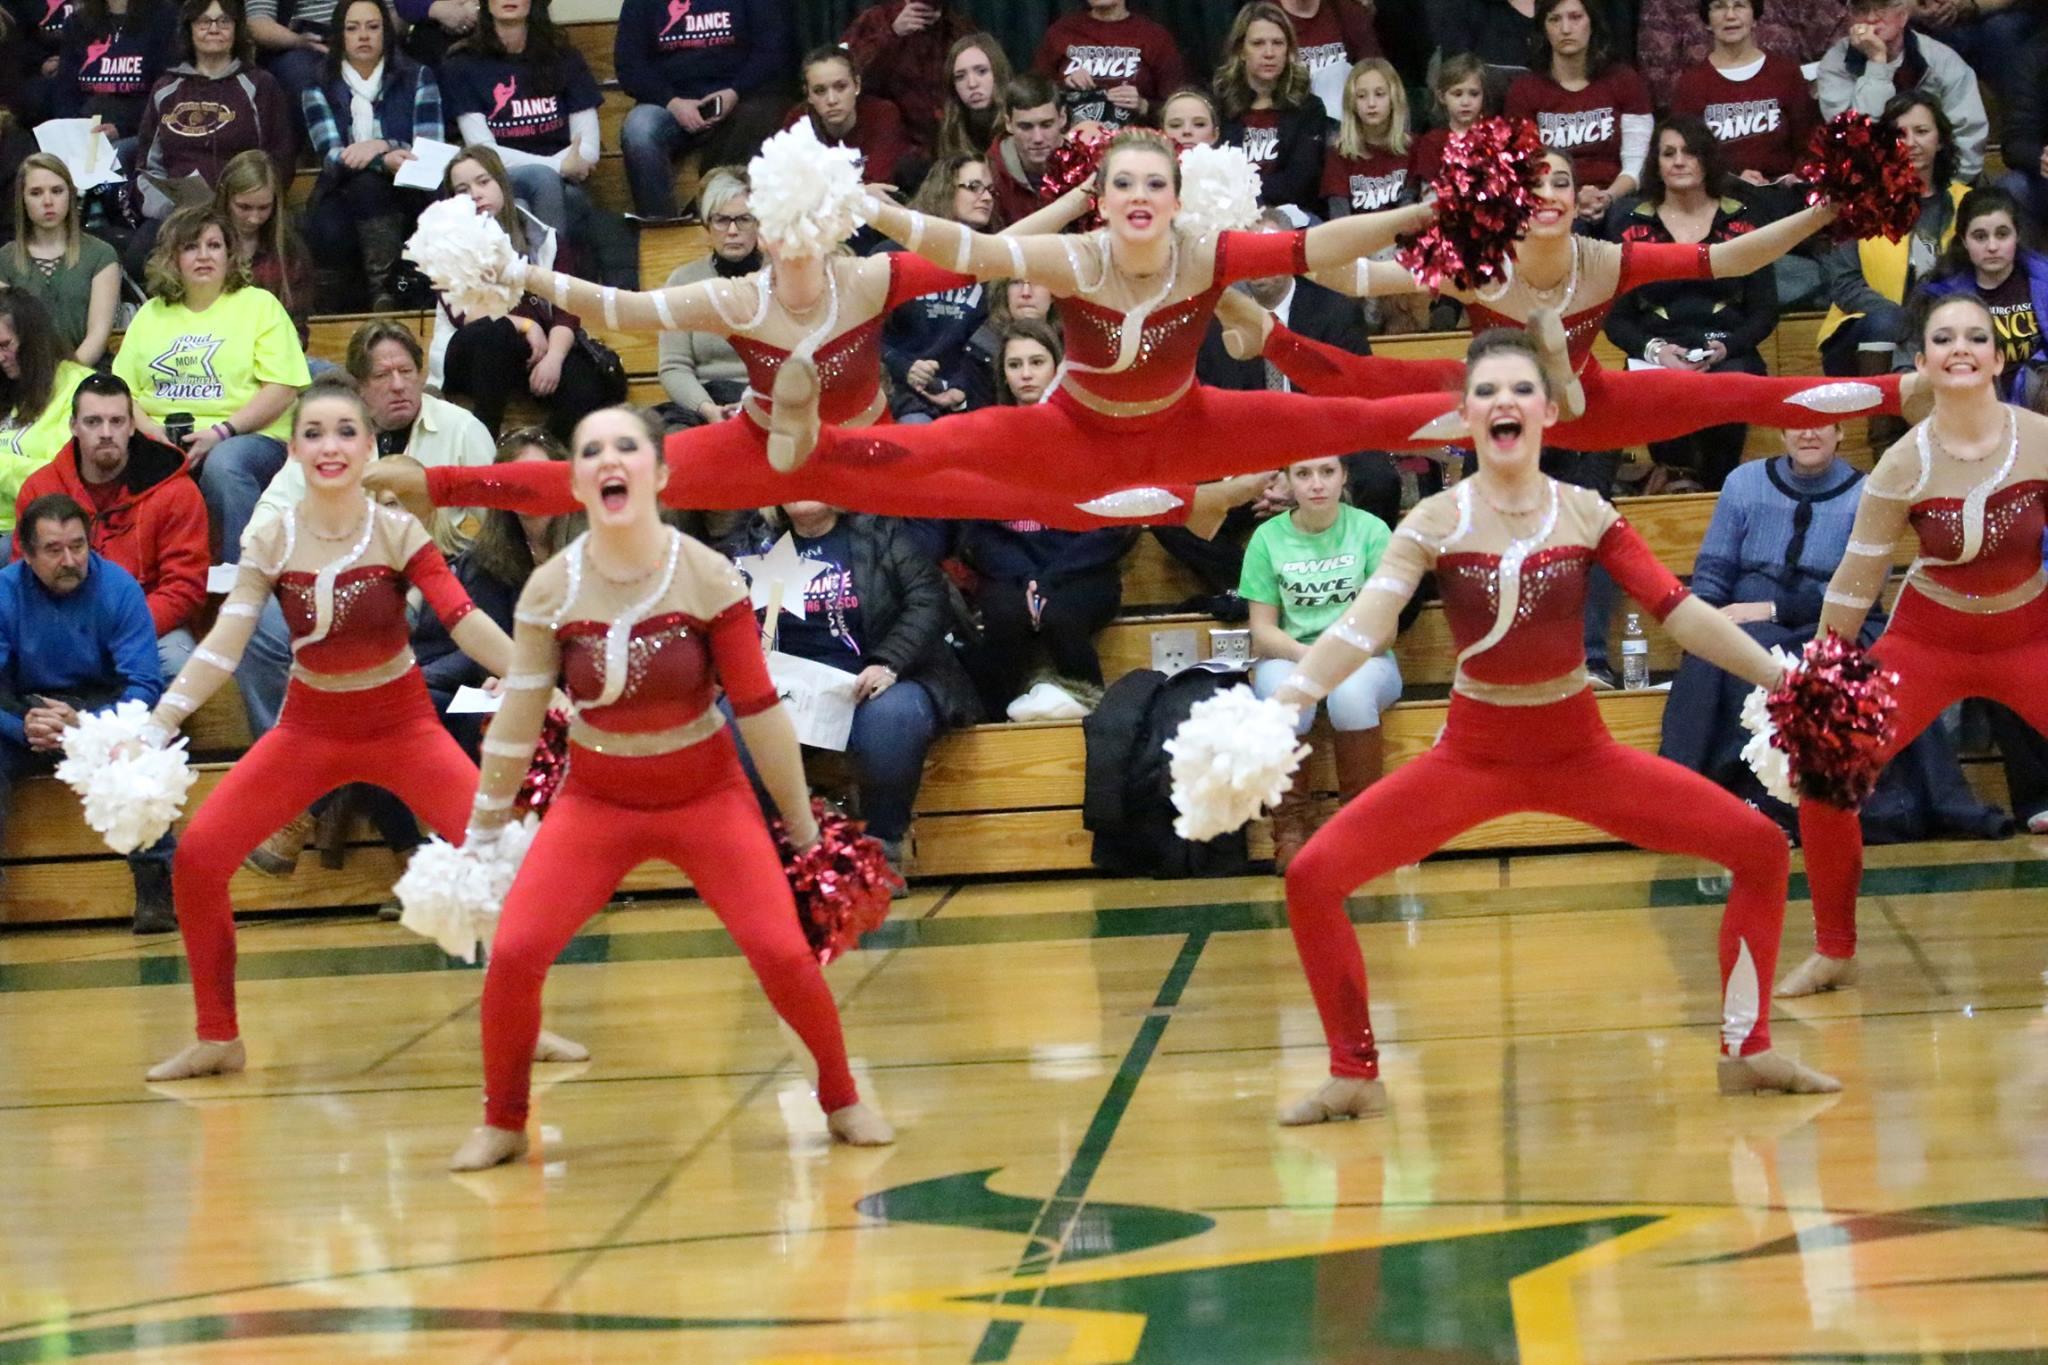 Kimberly High School Dance Team Custom Kick Costume